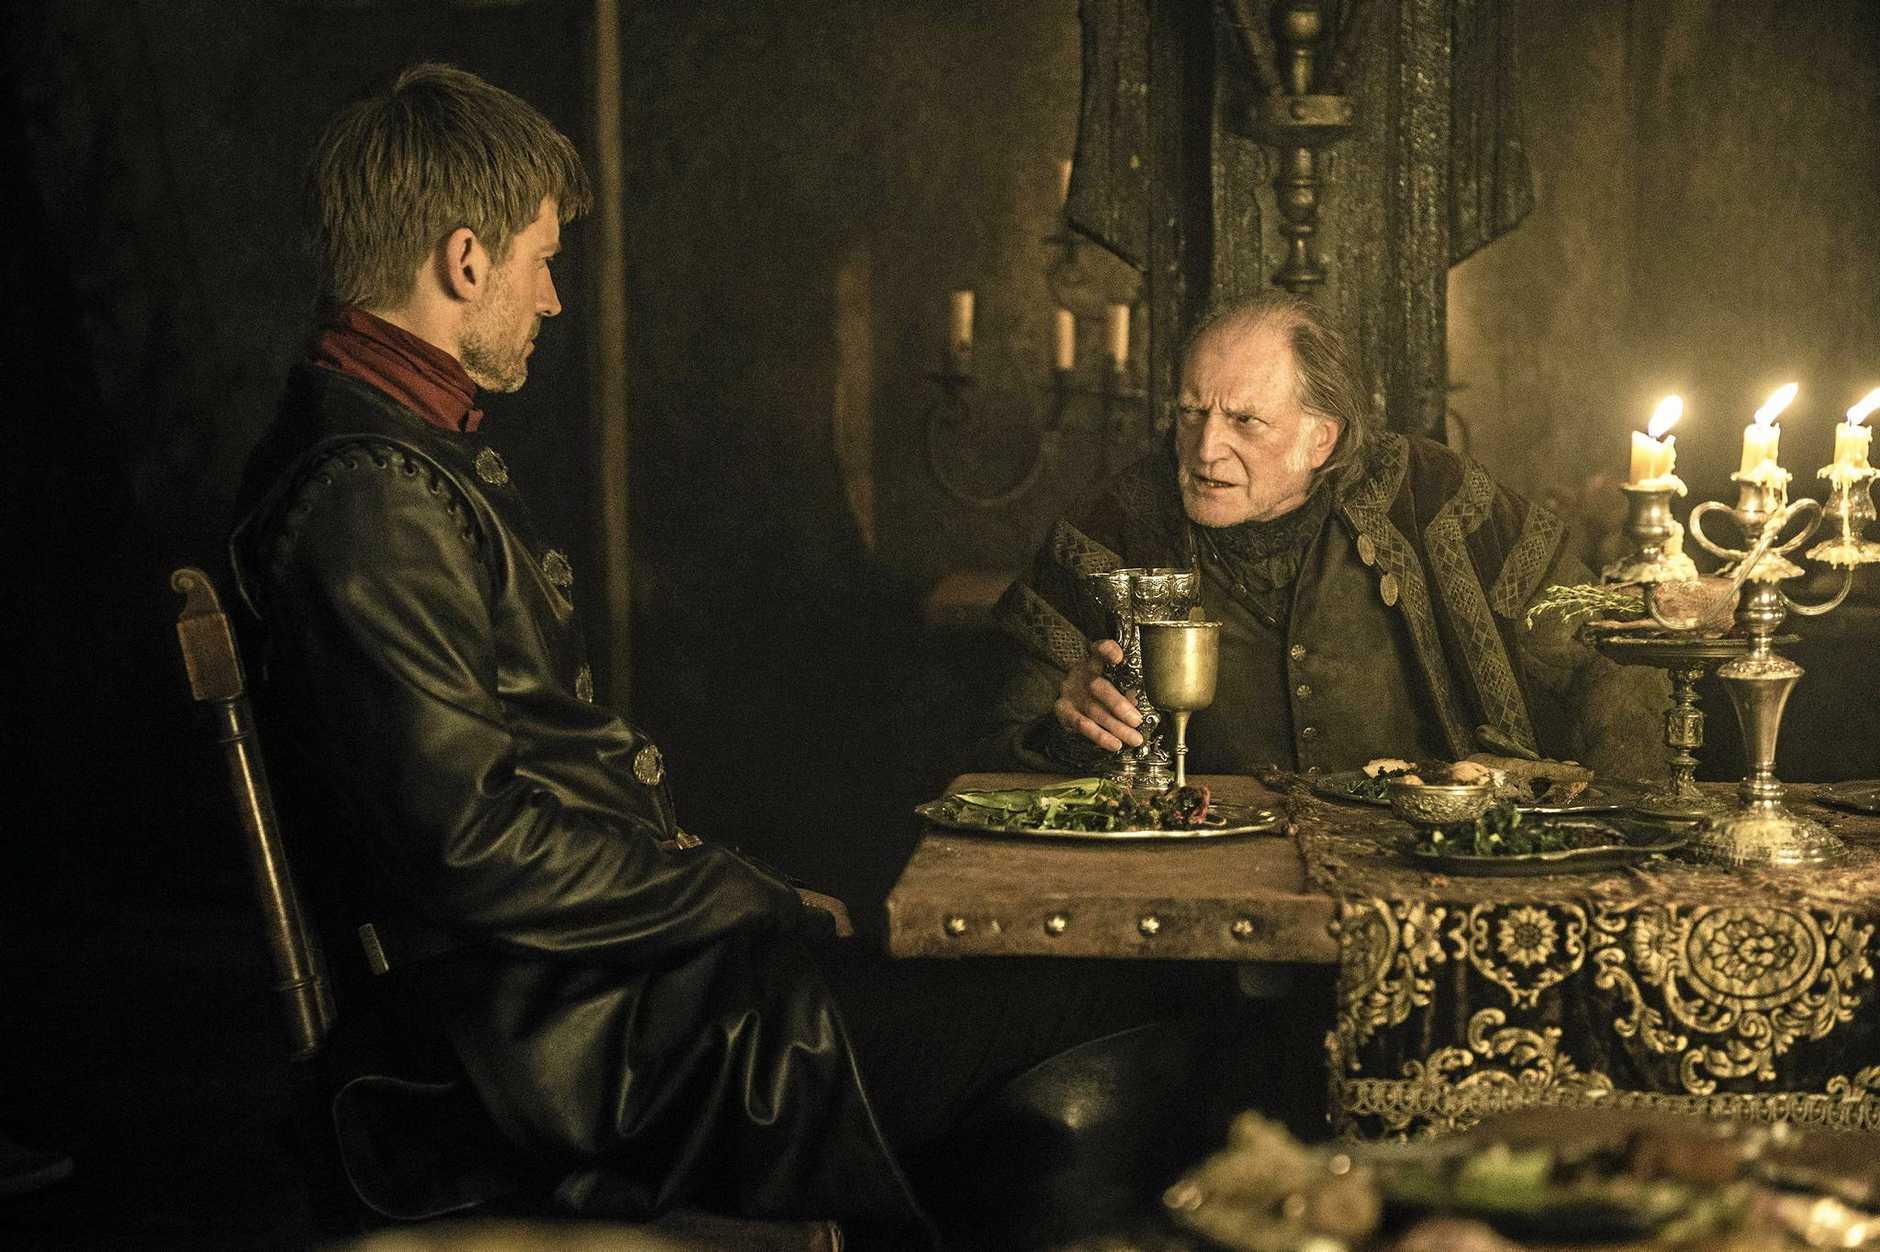 Nikolaj Coster-Waldau and David Bradley in a scene from season six episode 10 in Game of Thrones.